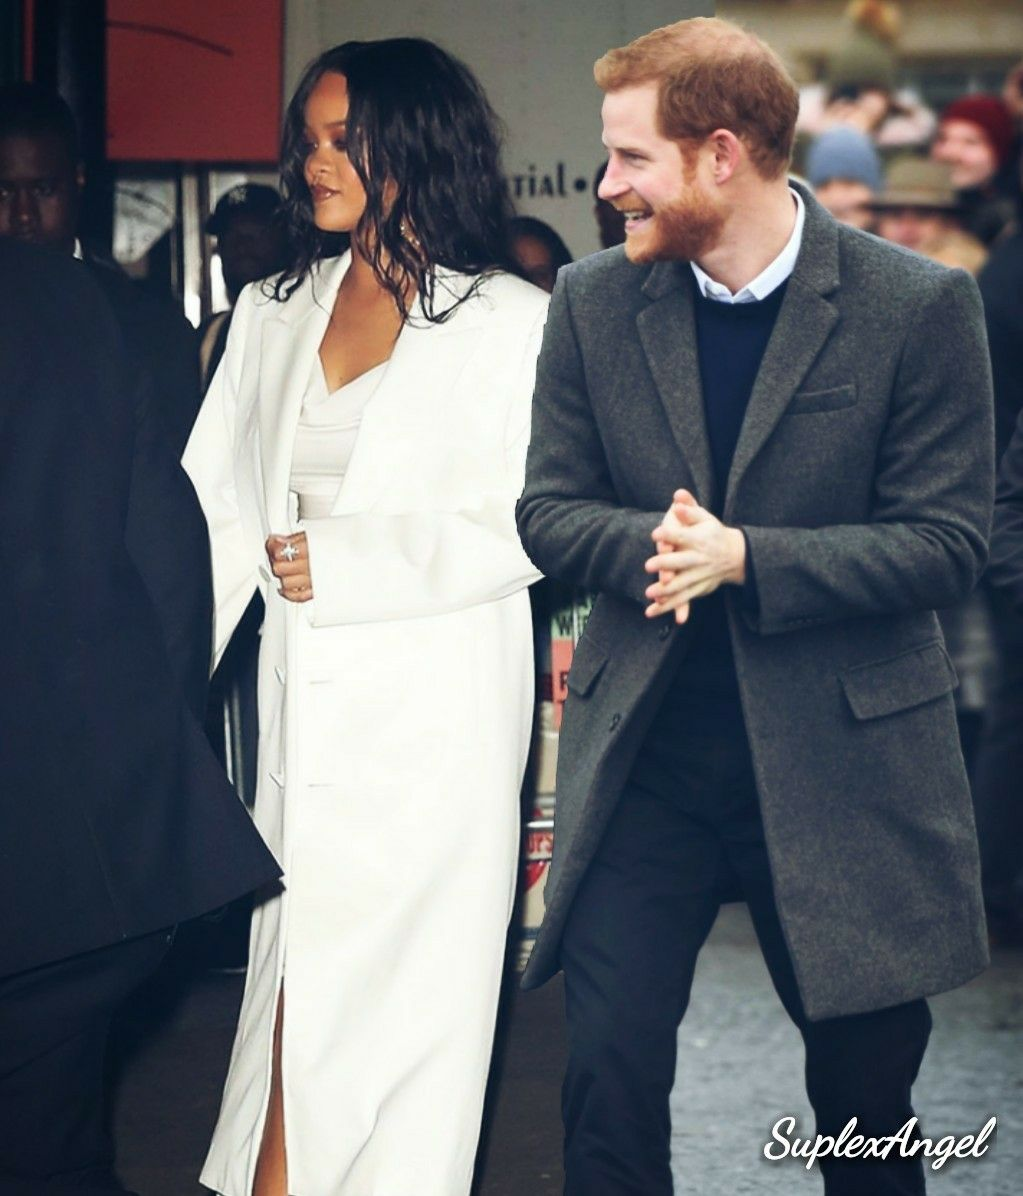 With Love, Rihanna » Prince Harry